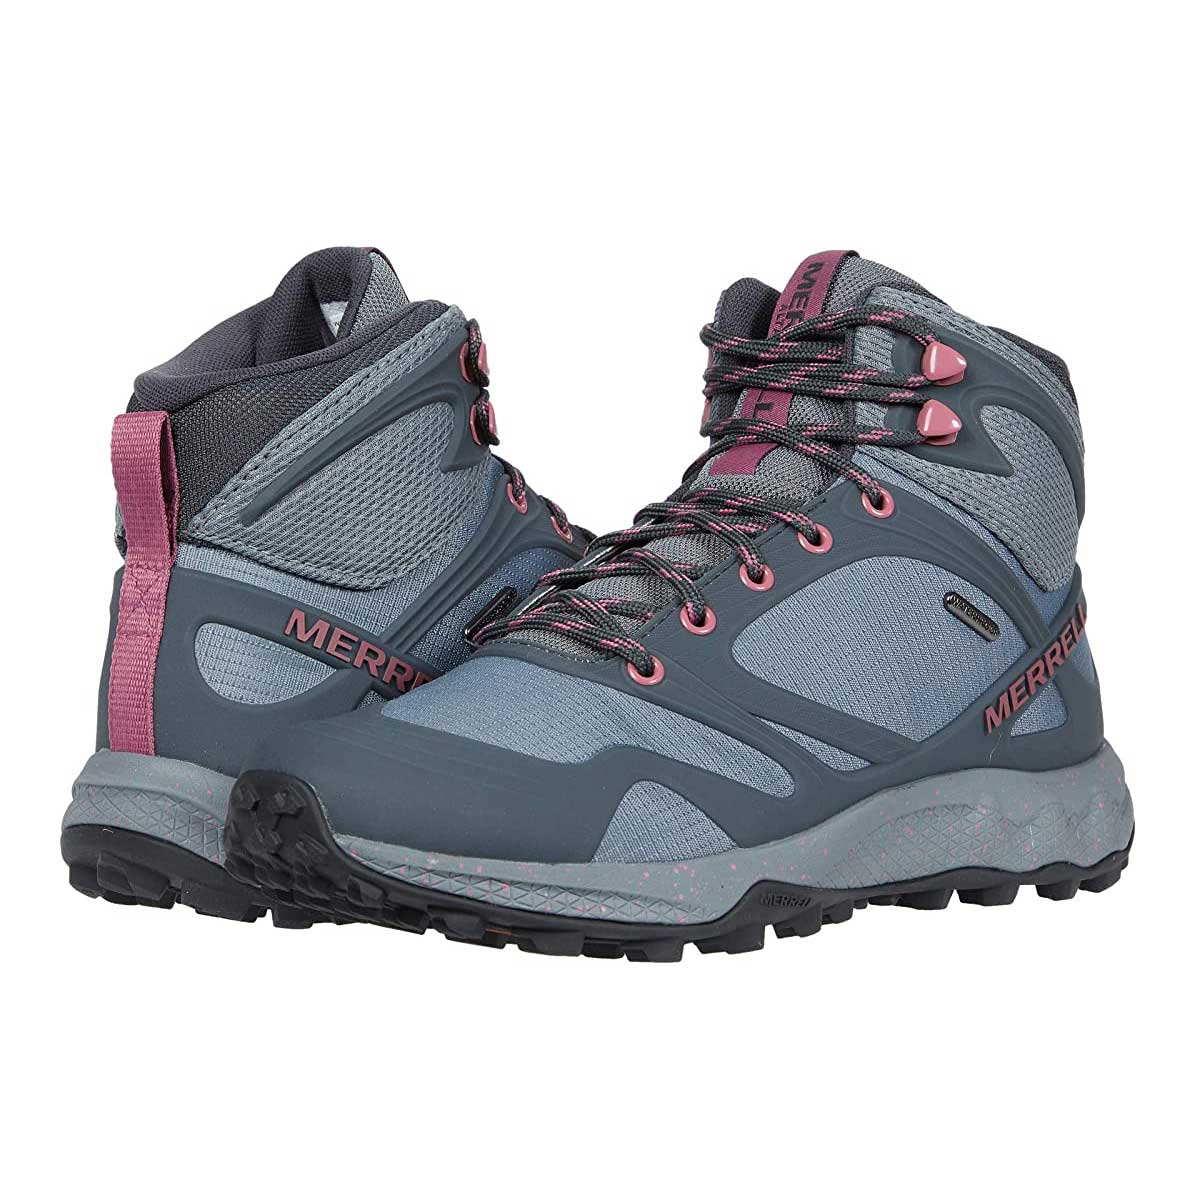 Cute-Hiking-Boots-Merrell